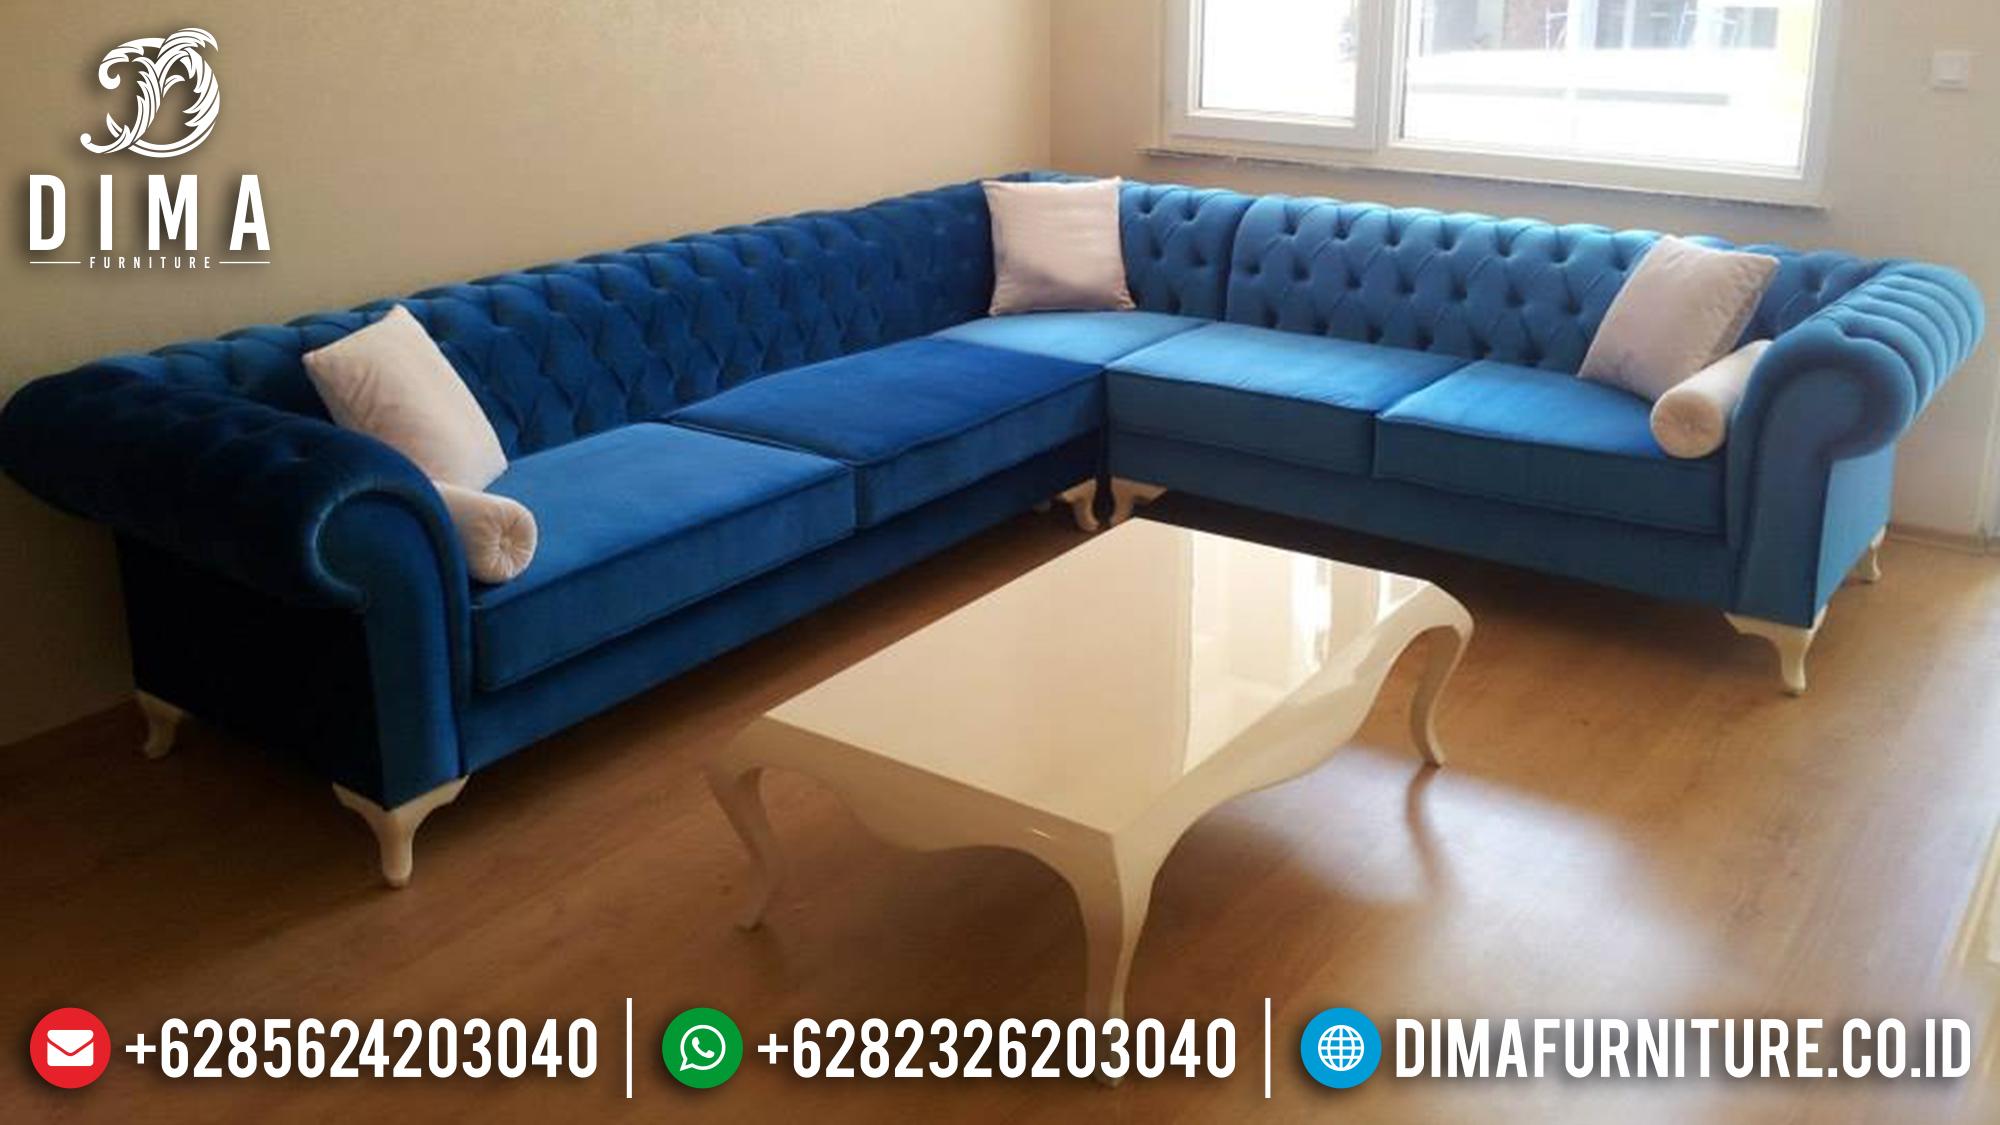 Kursi Ruang Tamu Set Sofa Tamu Sudut L Mewah Minimalis Jepara ST-0560 Gambar 2